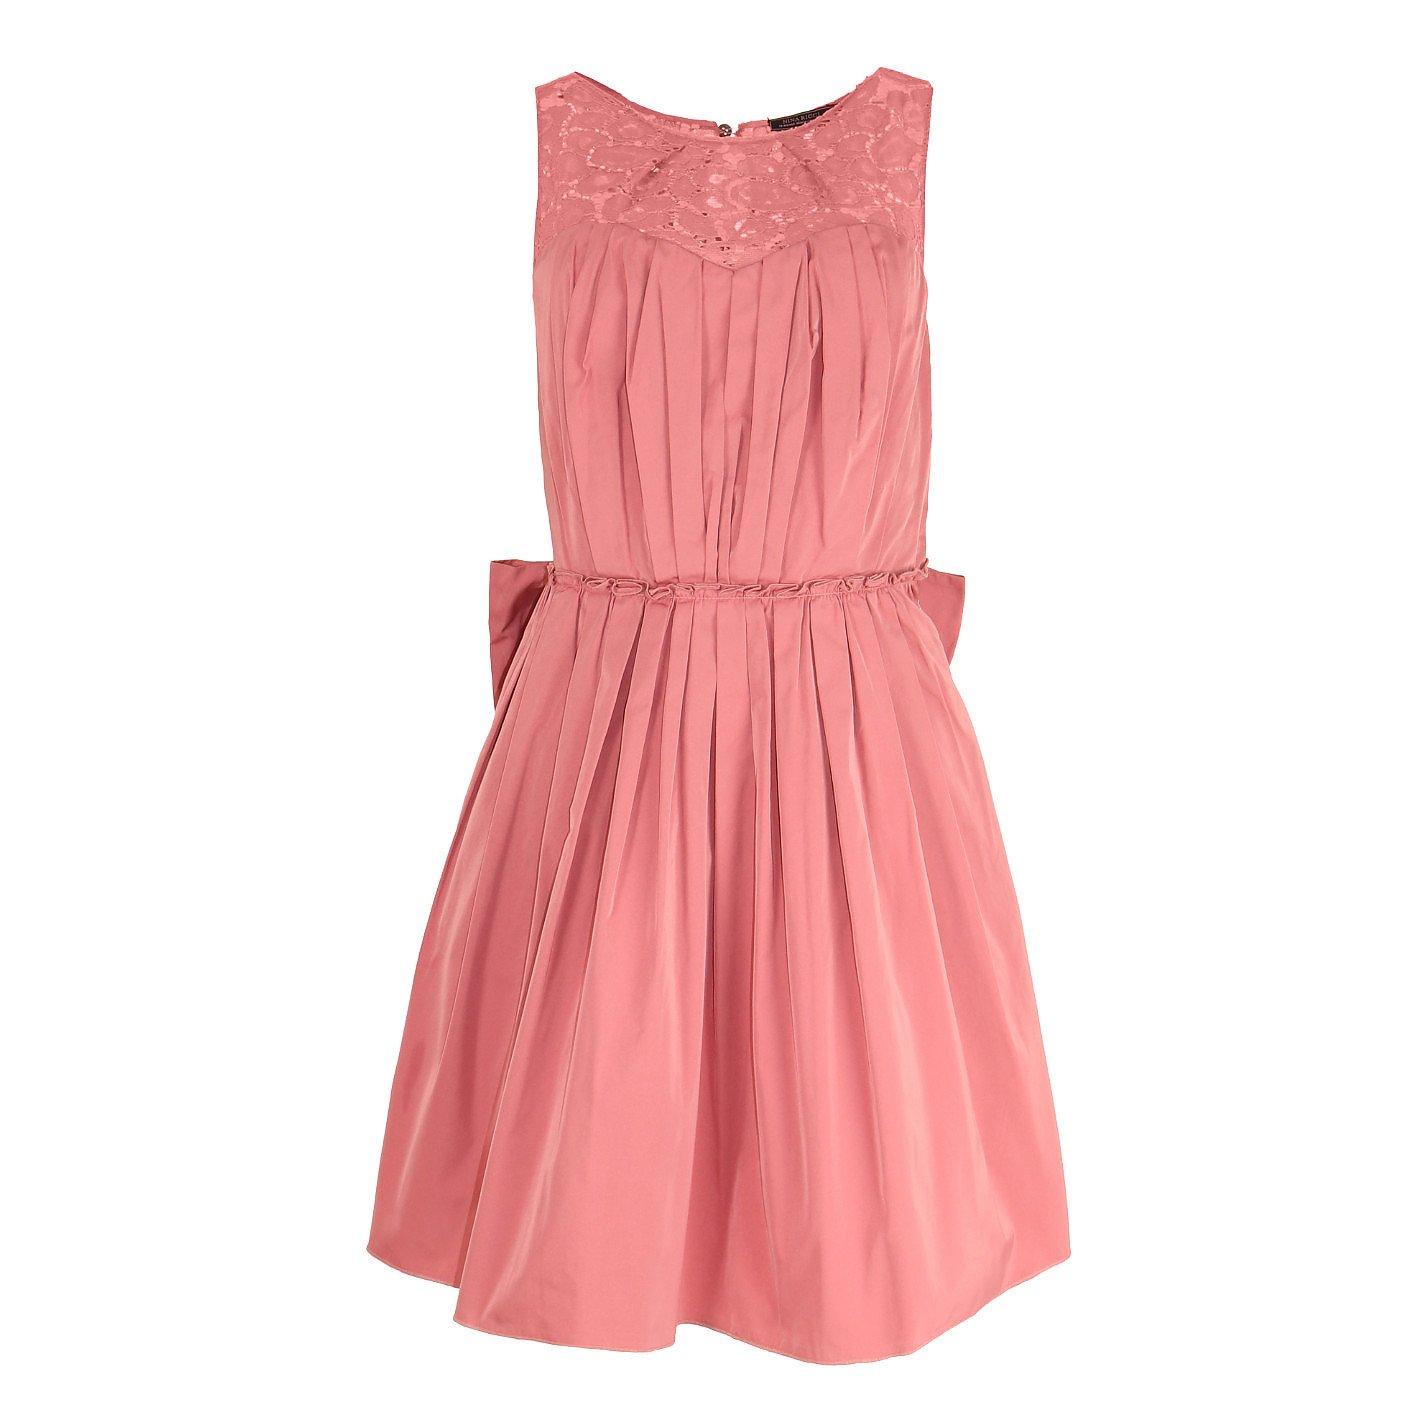 Nina Ricci Taffeta & Lace Dress